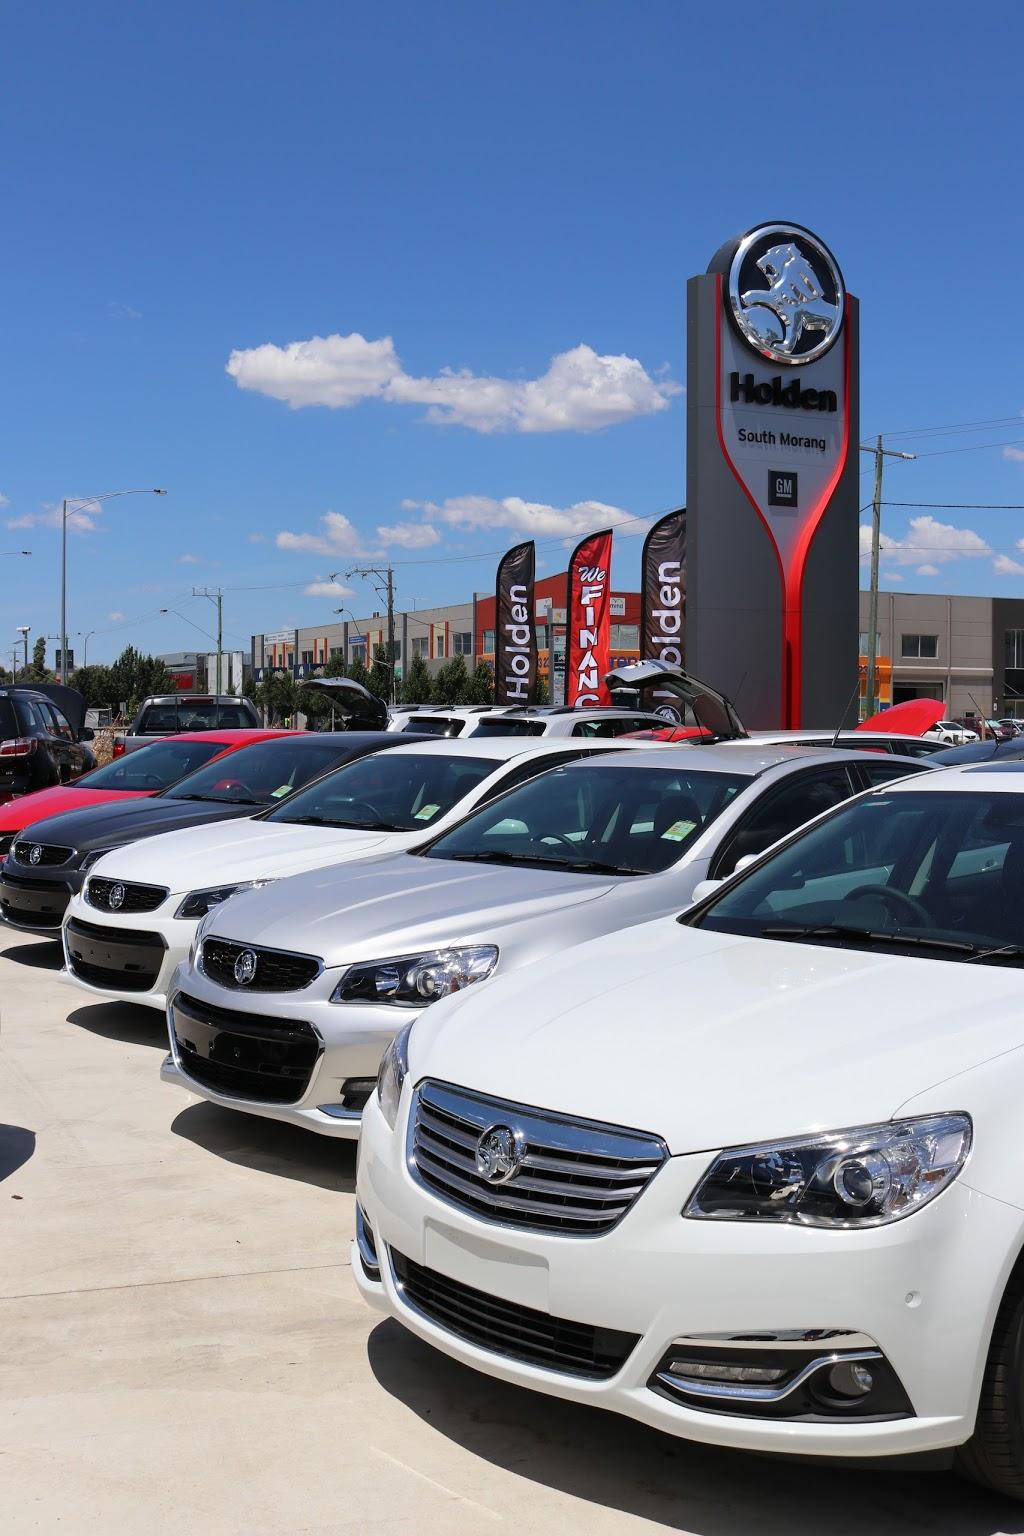 South Morang Holden | car dealer | 460 McDonalds Rd, South Morang VIC 3752, Australia | 0384571600 OR +61 3 8457 1600